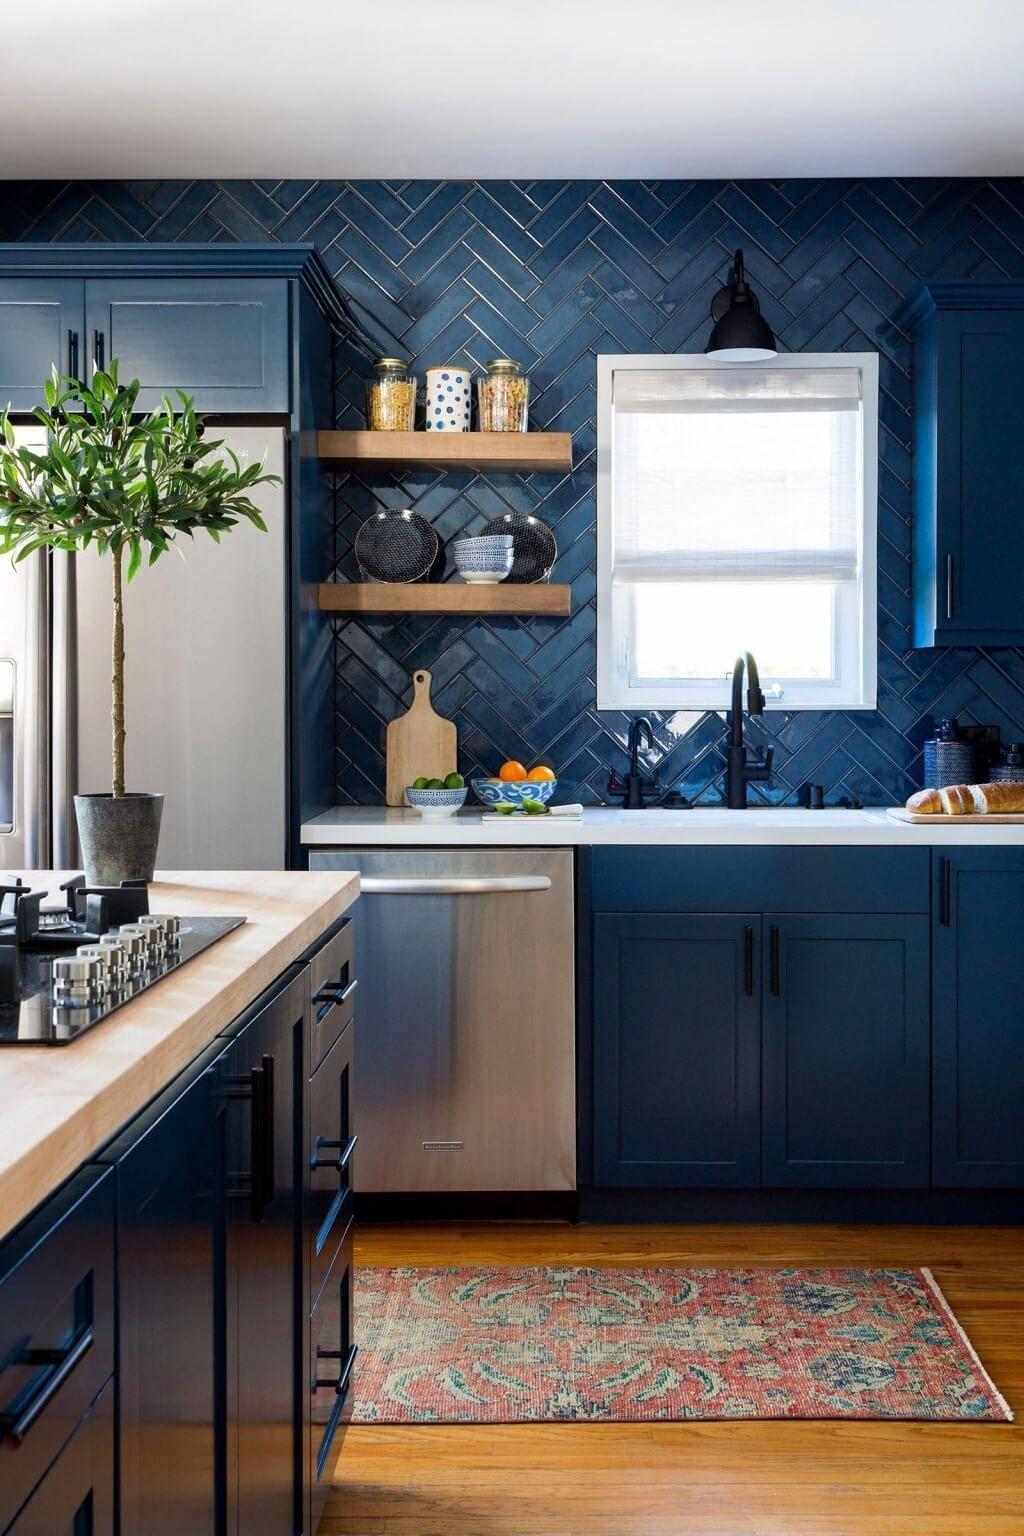 10 Dark Kitchen Backsplash Ideas 2020 Dramatic And Cool